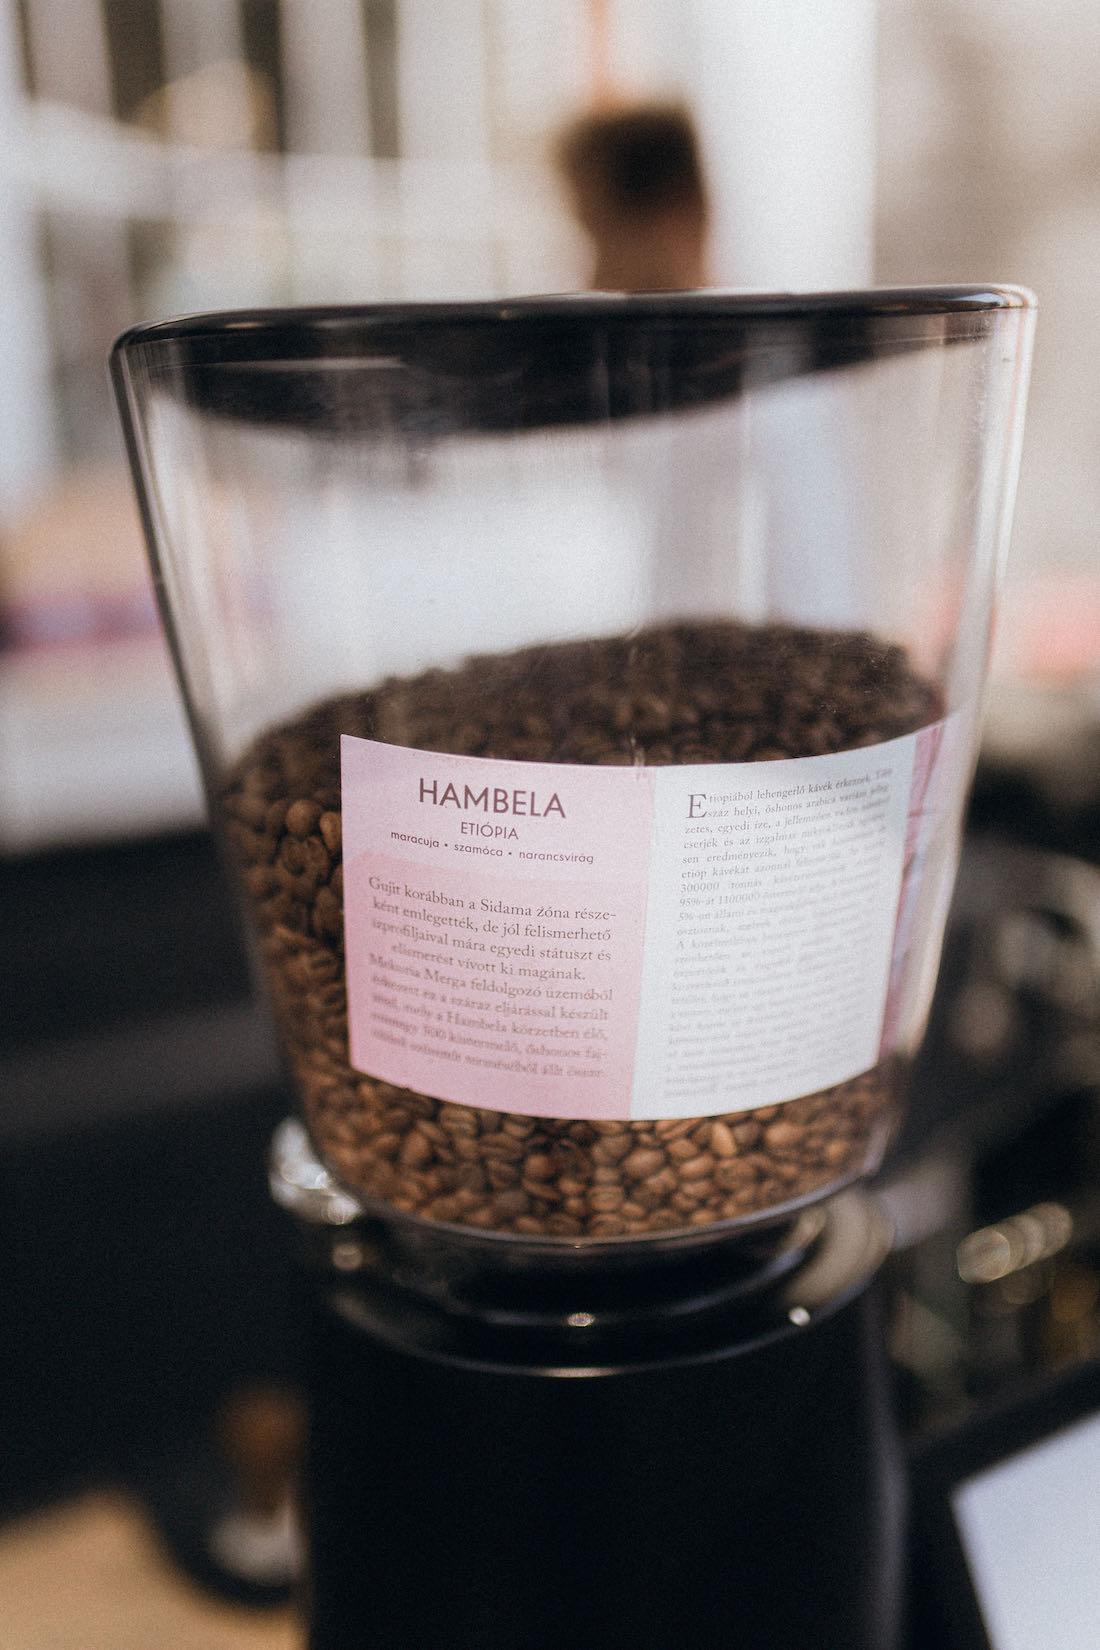 Casino Mocca Hambela etióp világos pörkölésű kávé